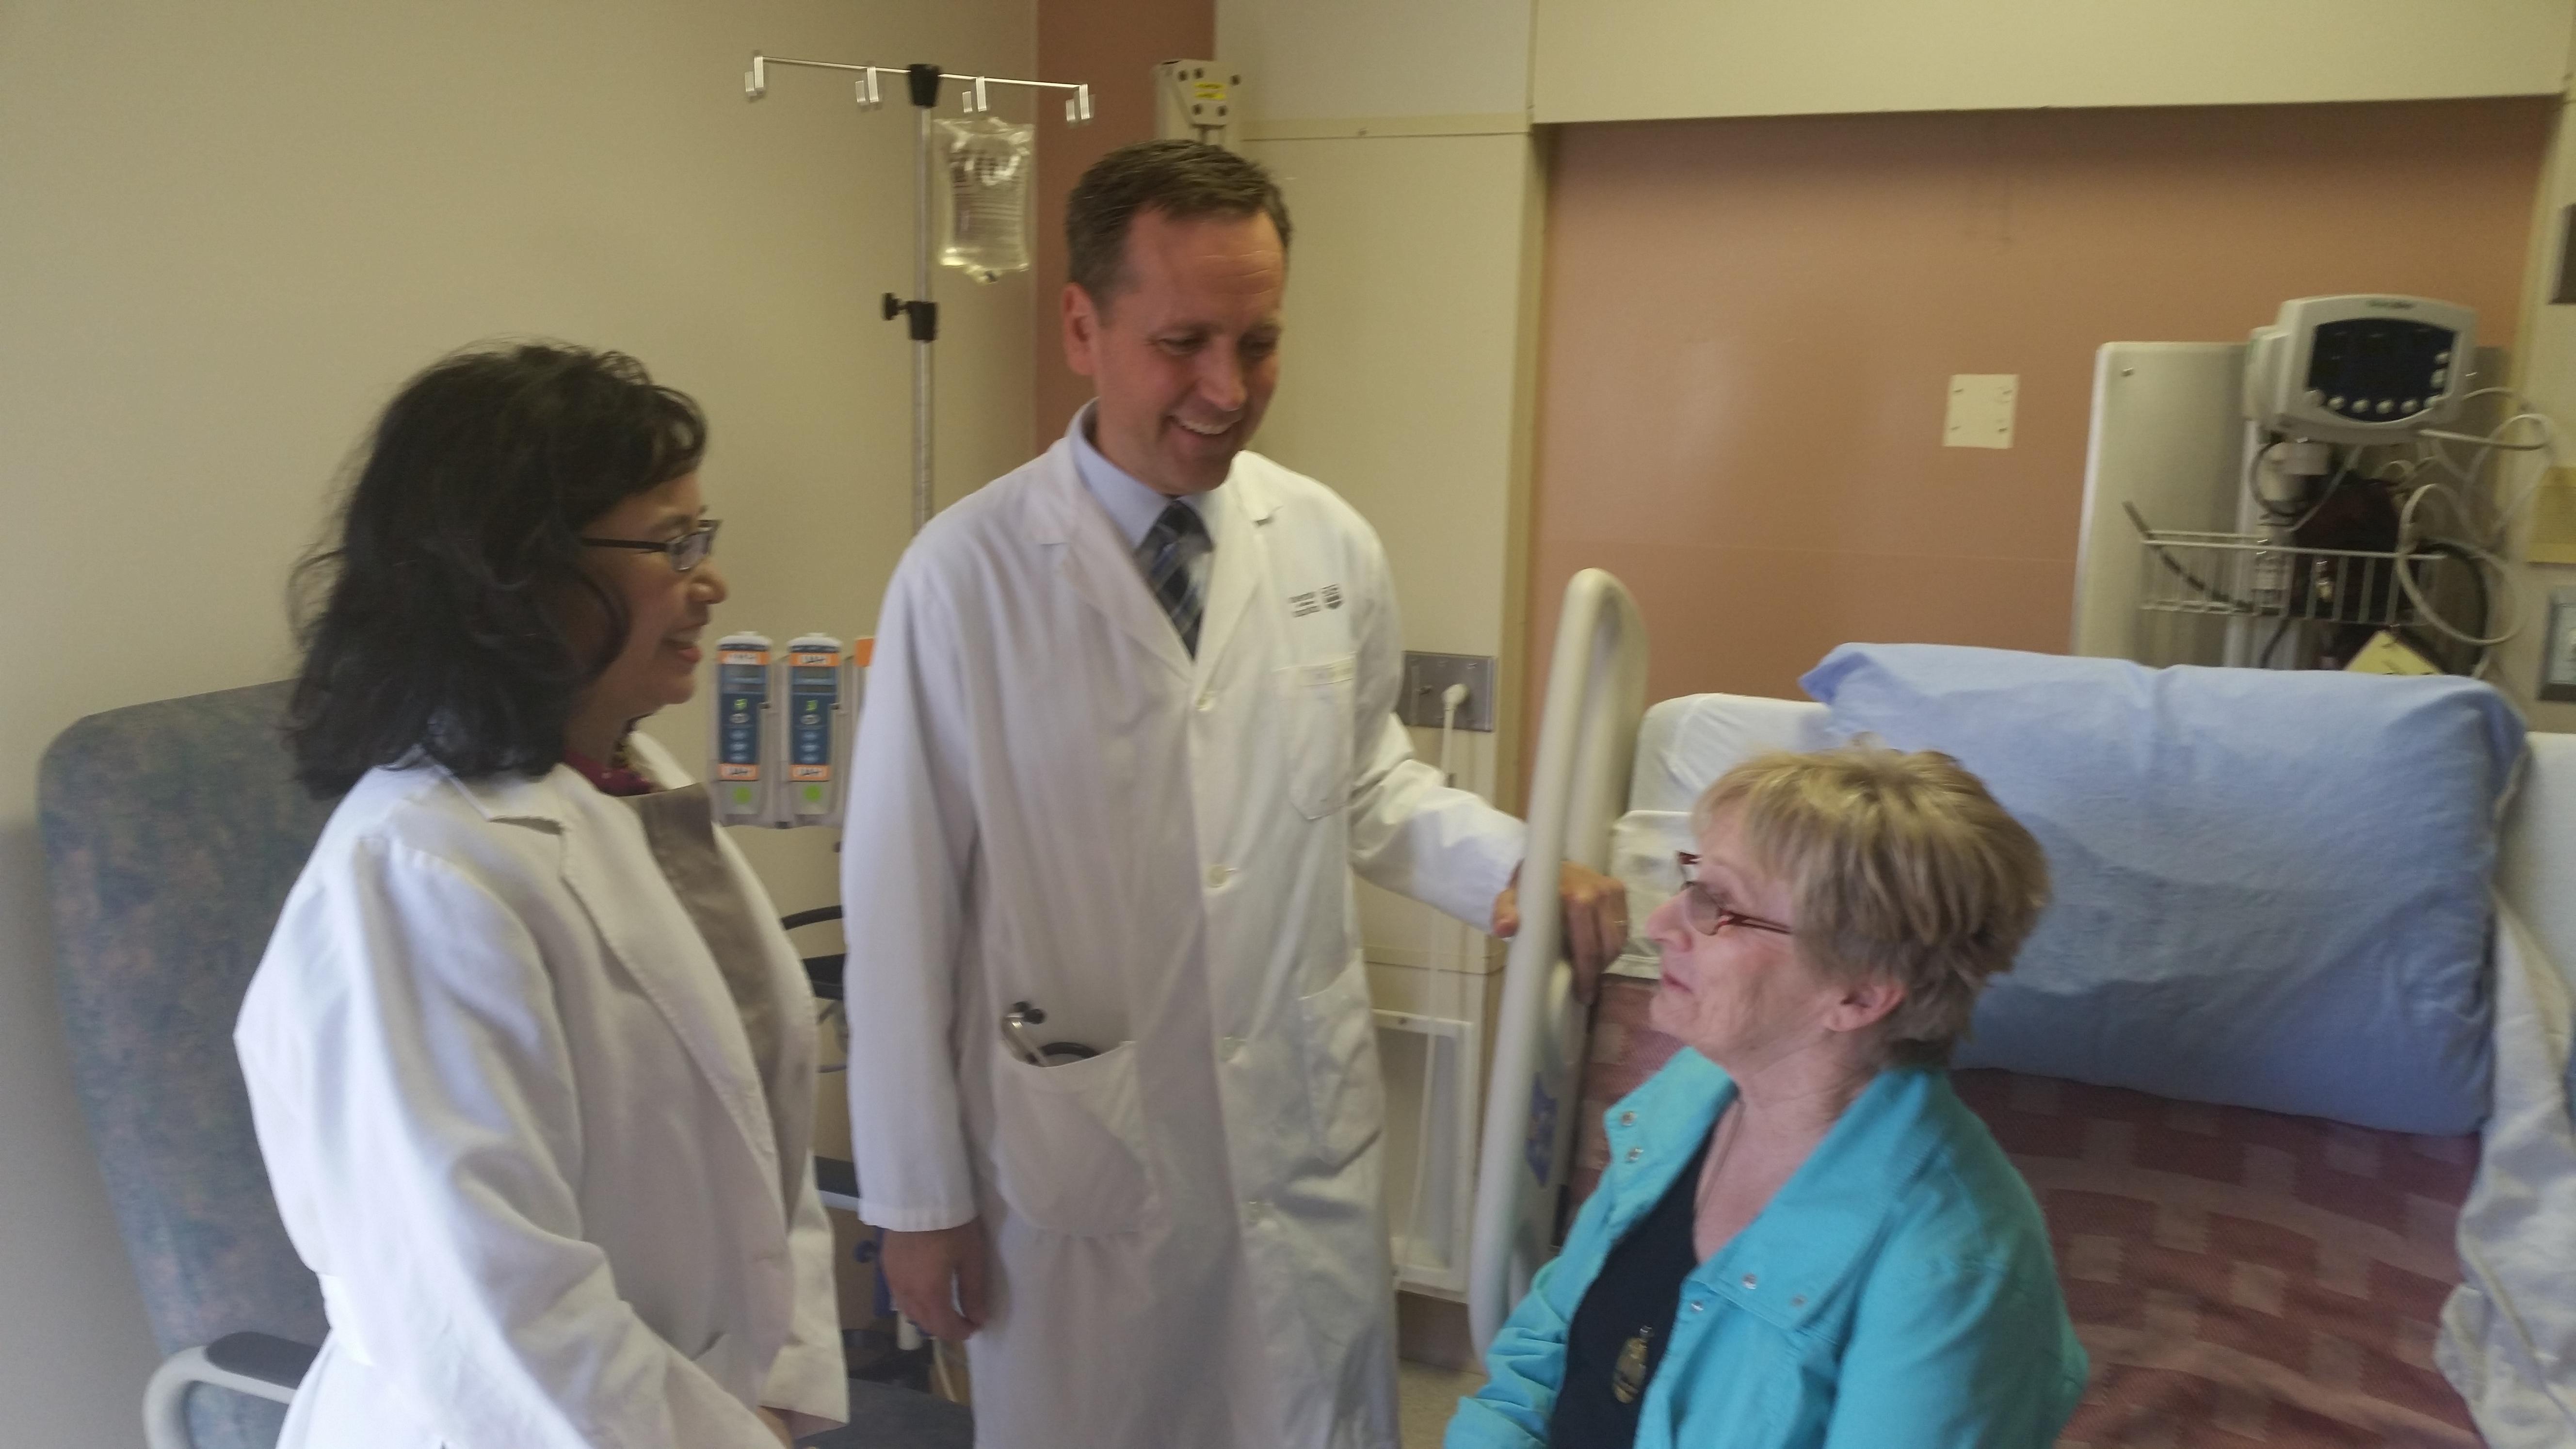 Rachel Khadaroo and Darryl Rolfson speak with former patient Susan Gokiert